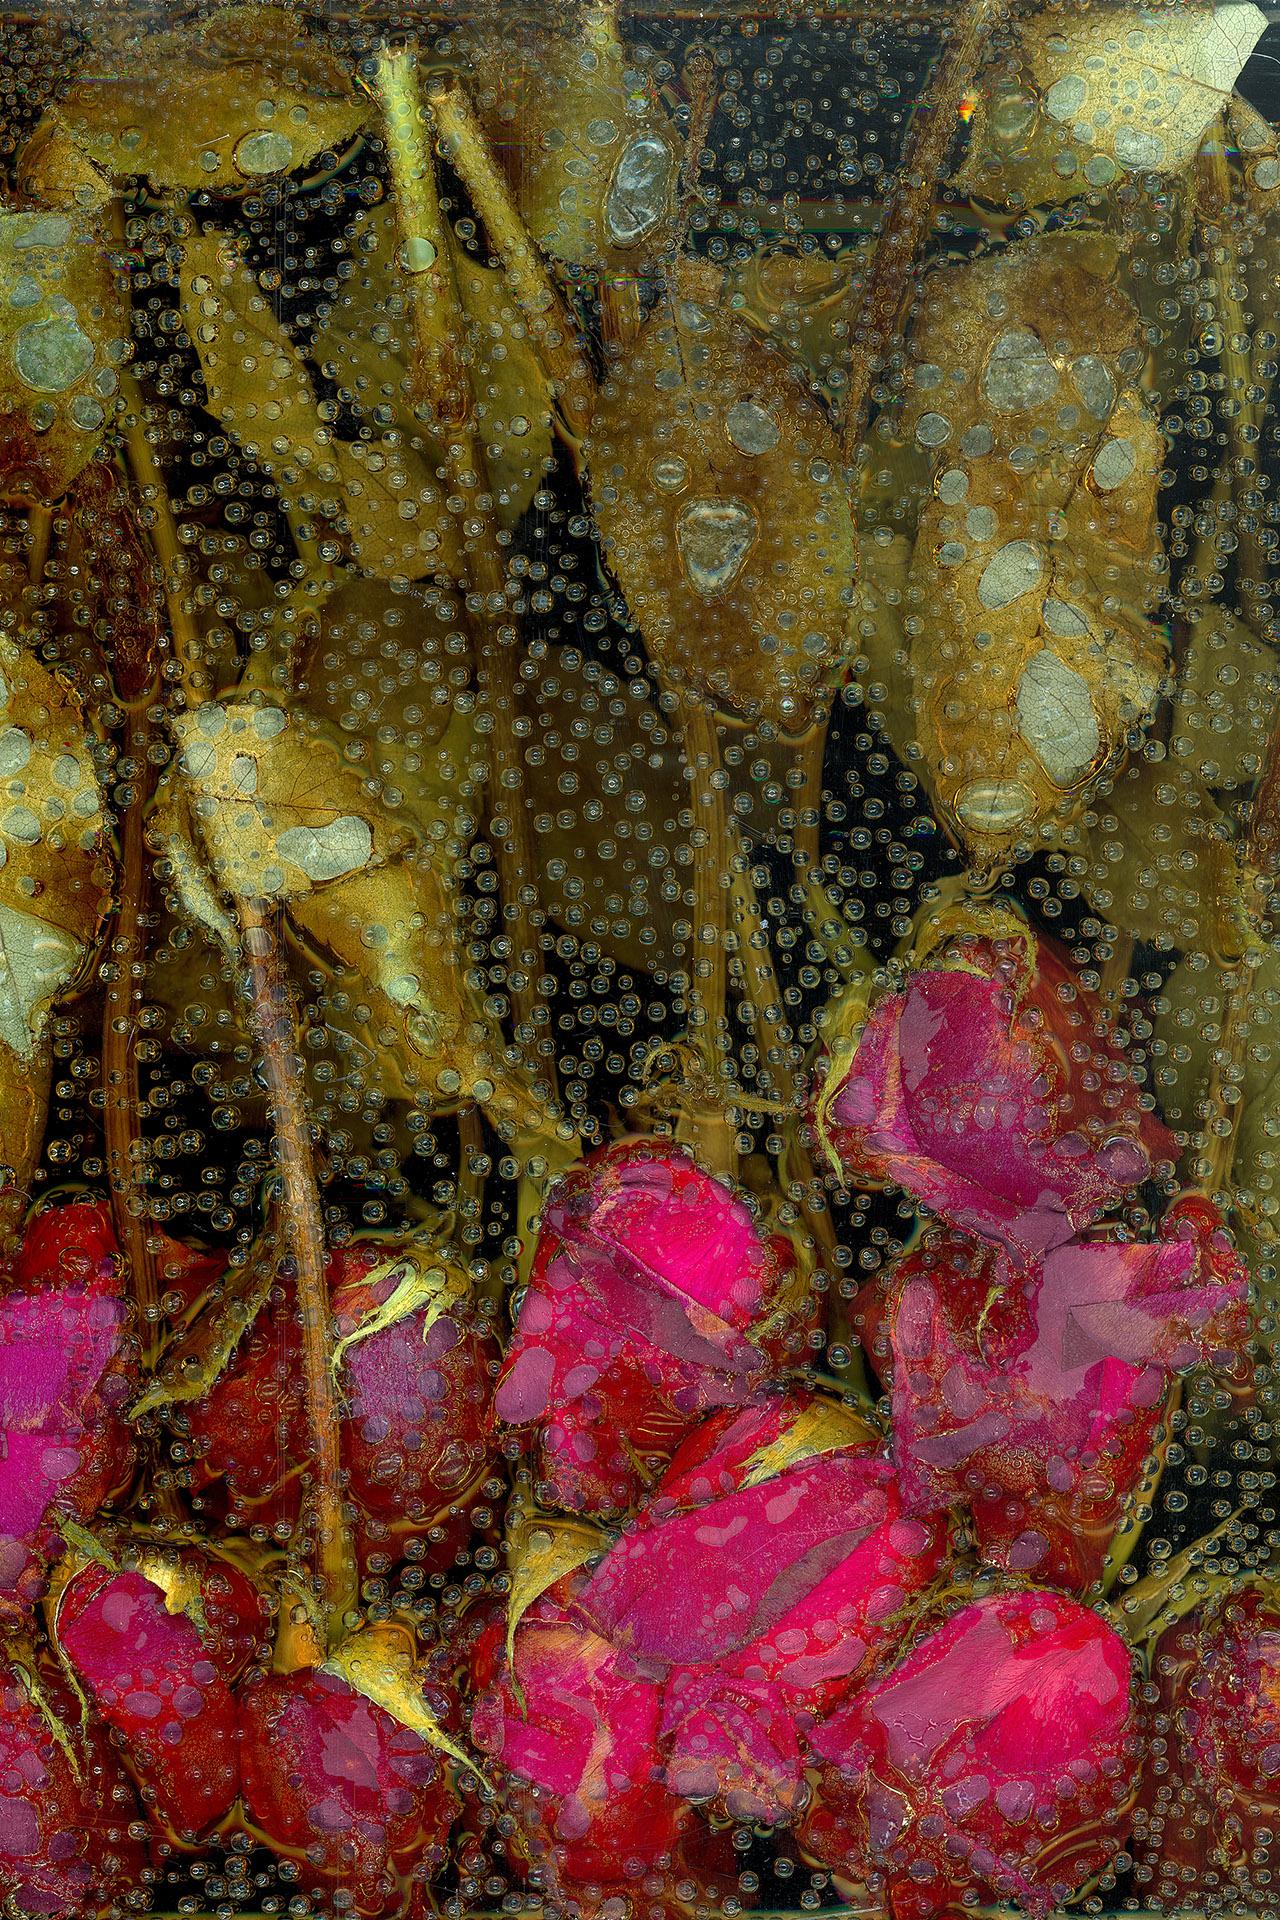 victoria marie bee,  la petite mort ,2016  [click on image for fullscreen]